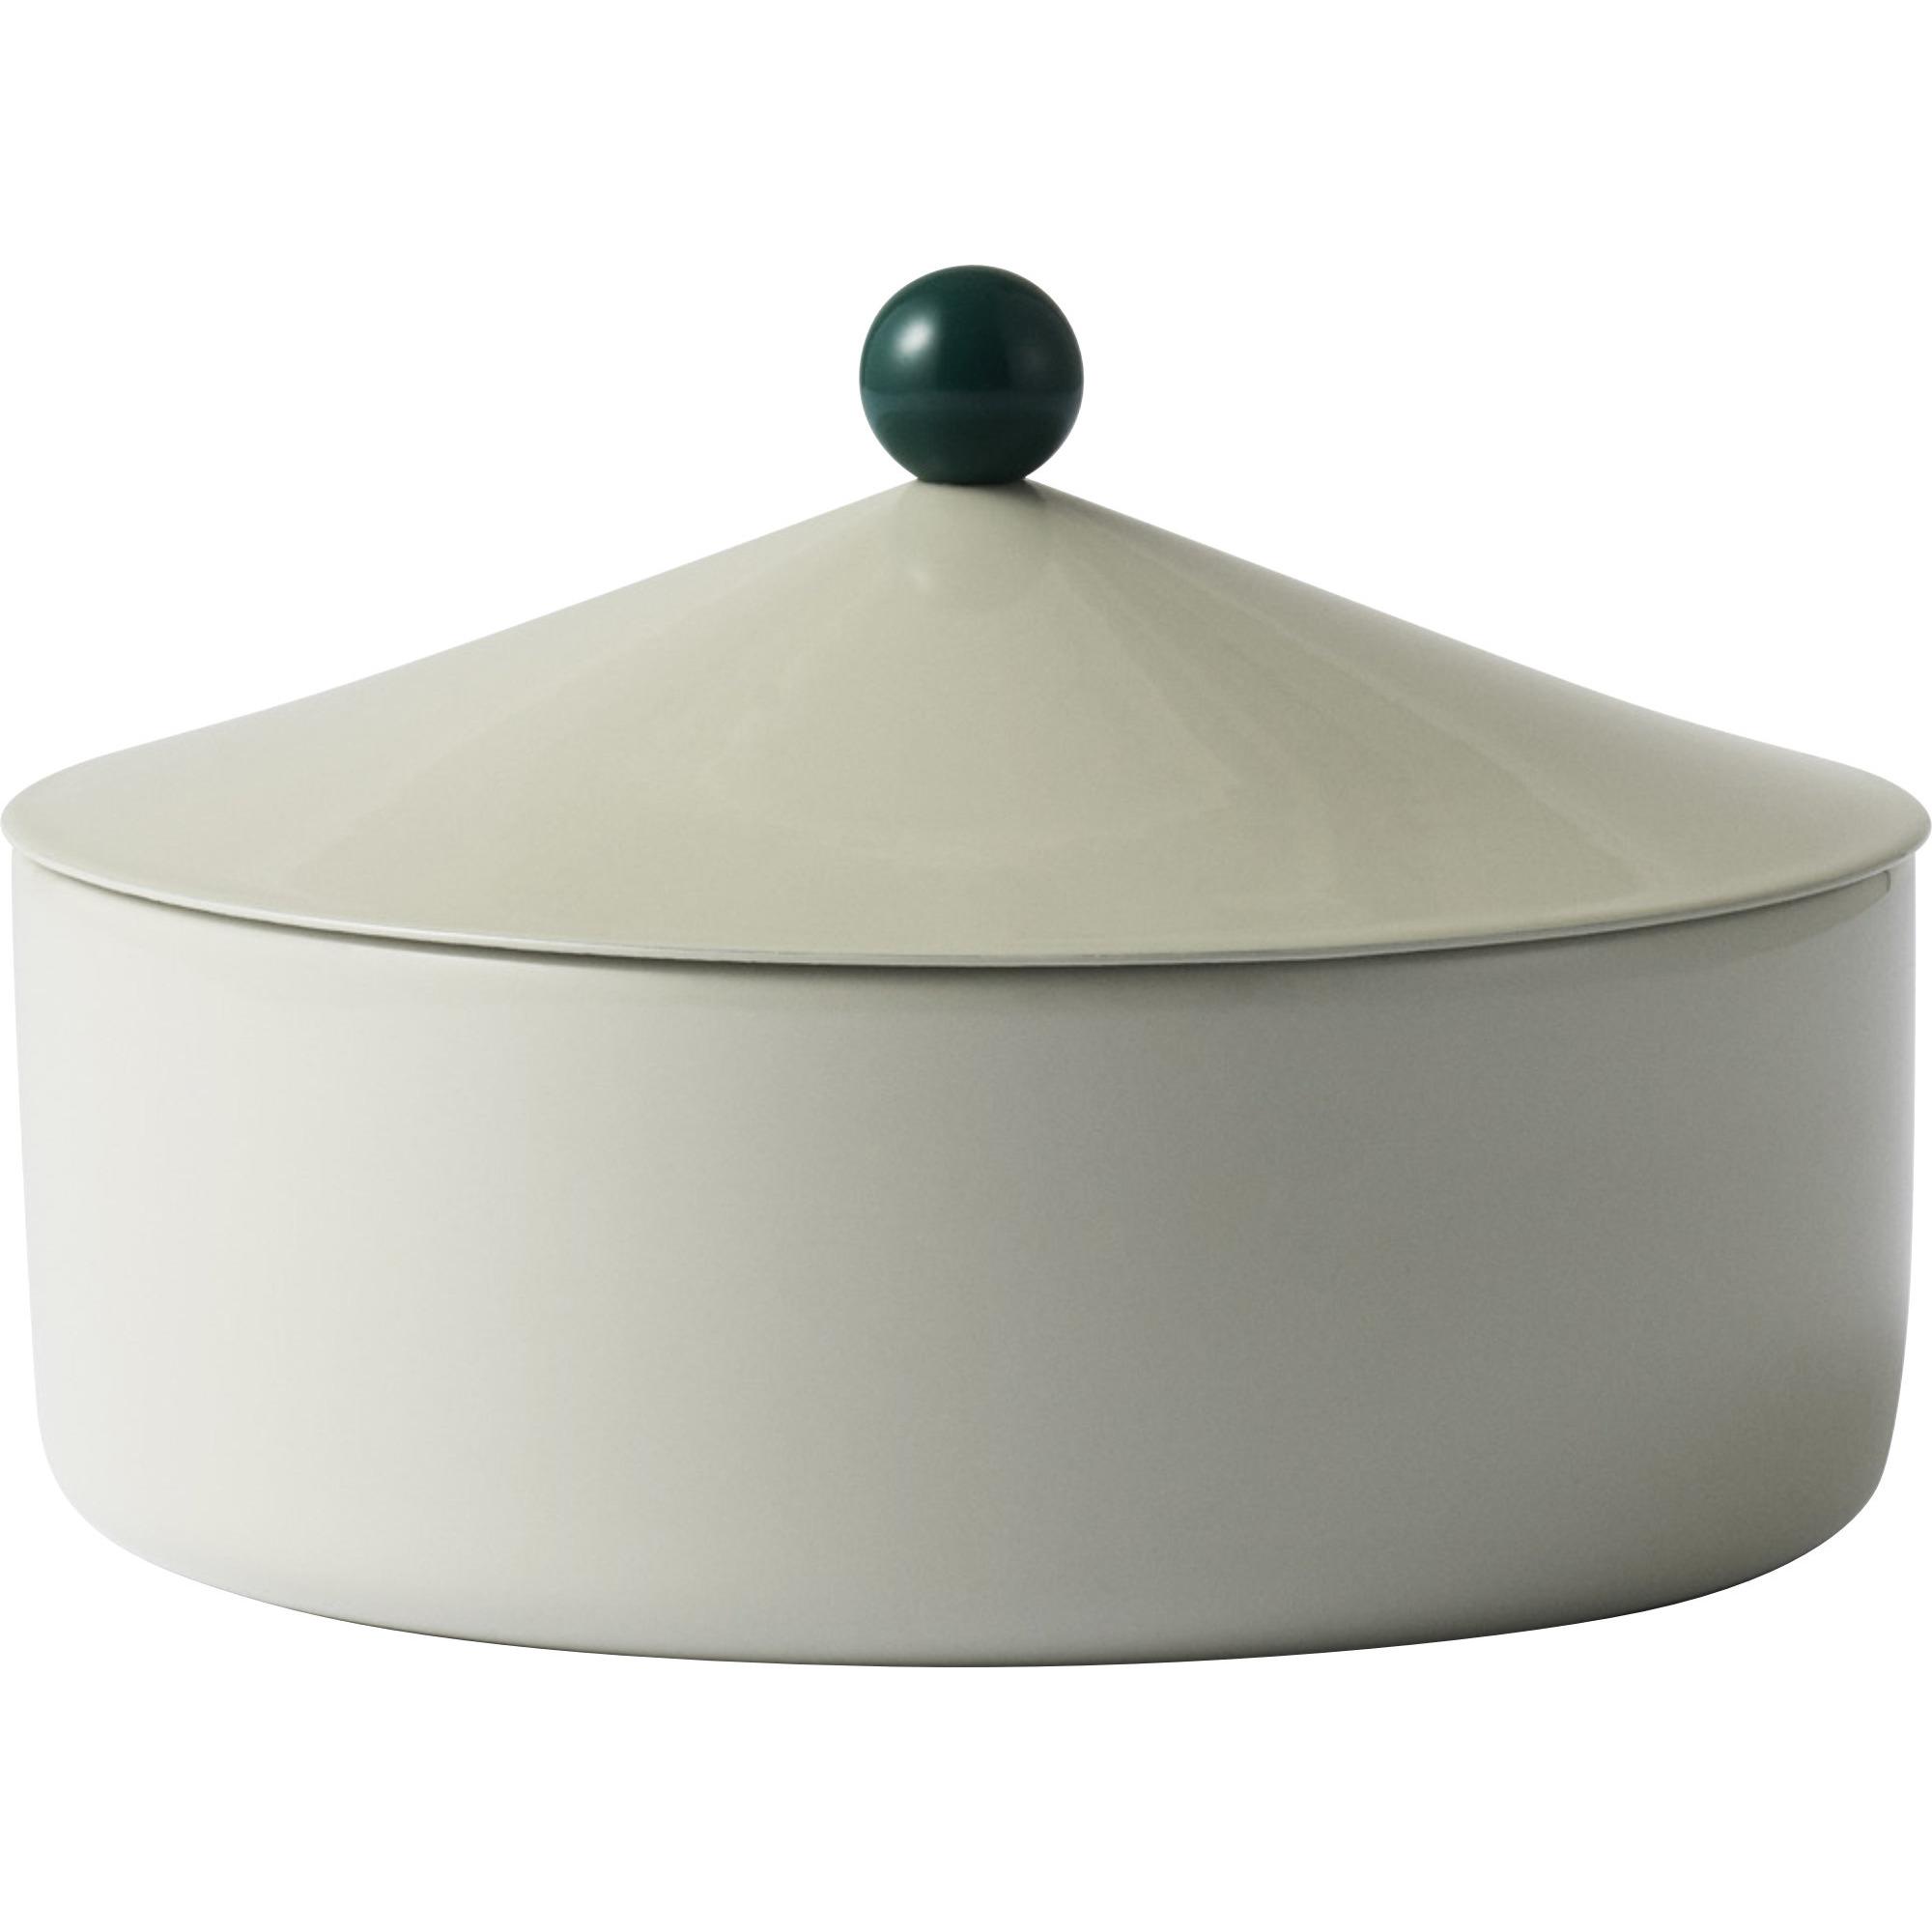 Normann Copenhagen Marquee Box Medium Antique Celadon